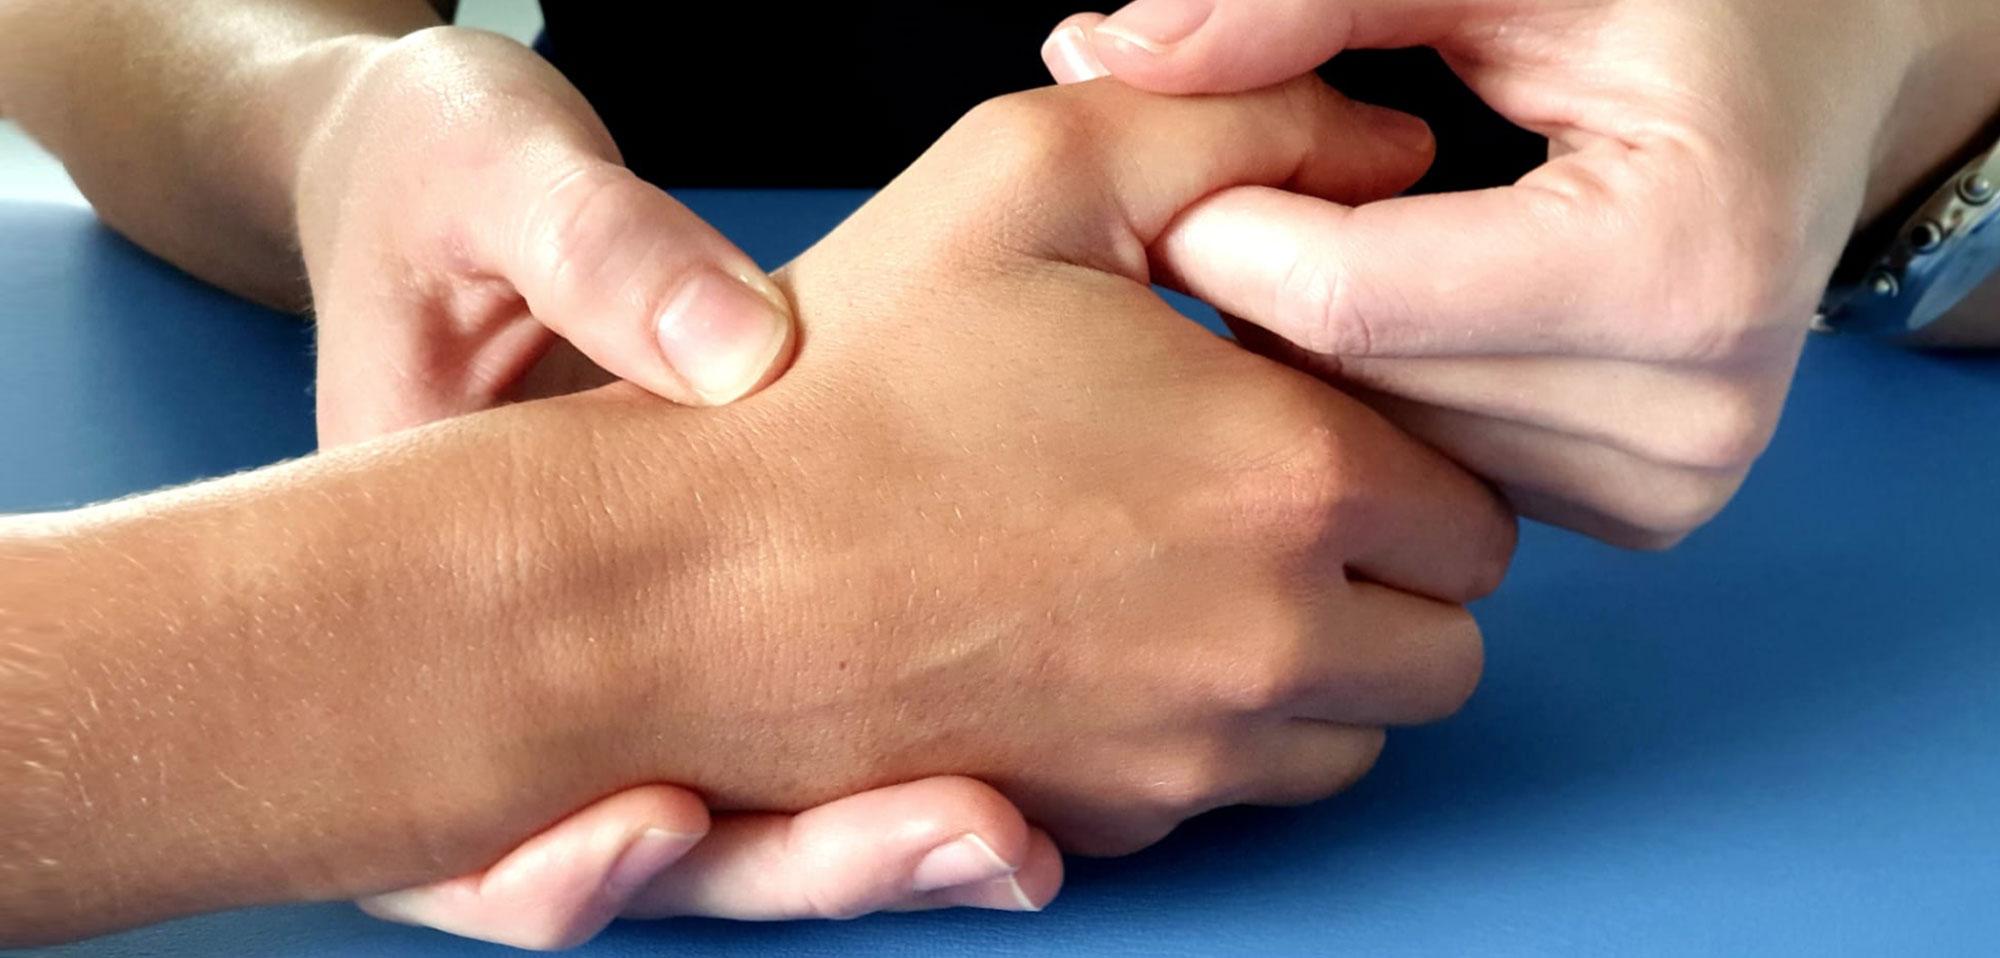 Rhizarthrose, pathologie fréquente de la main